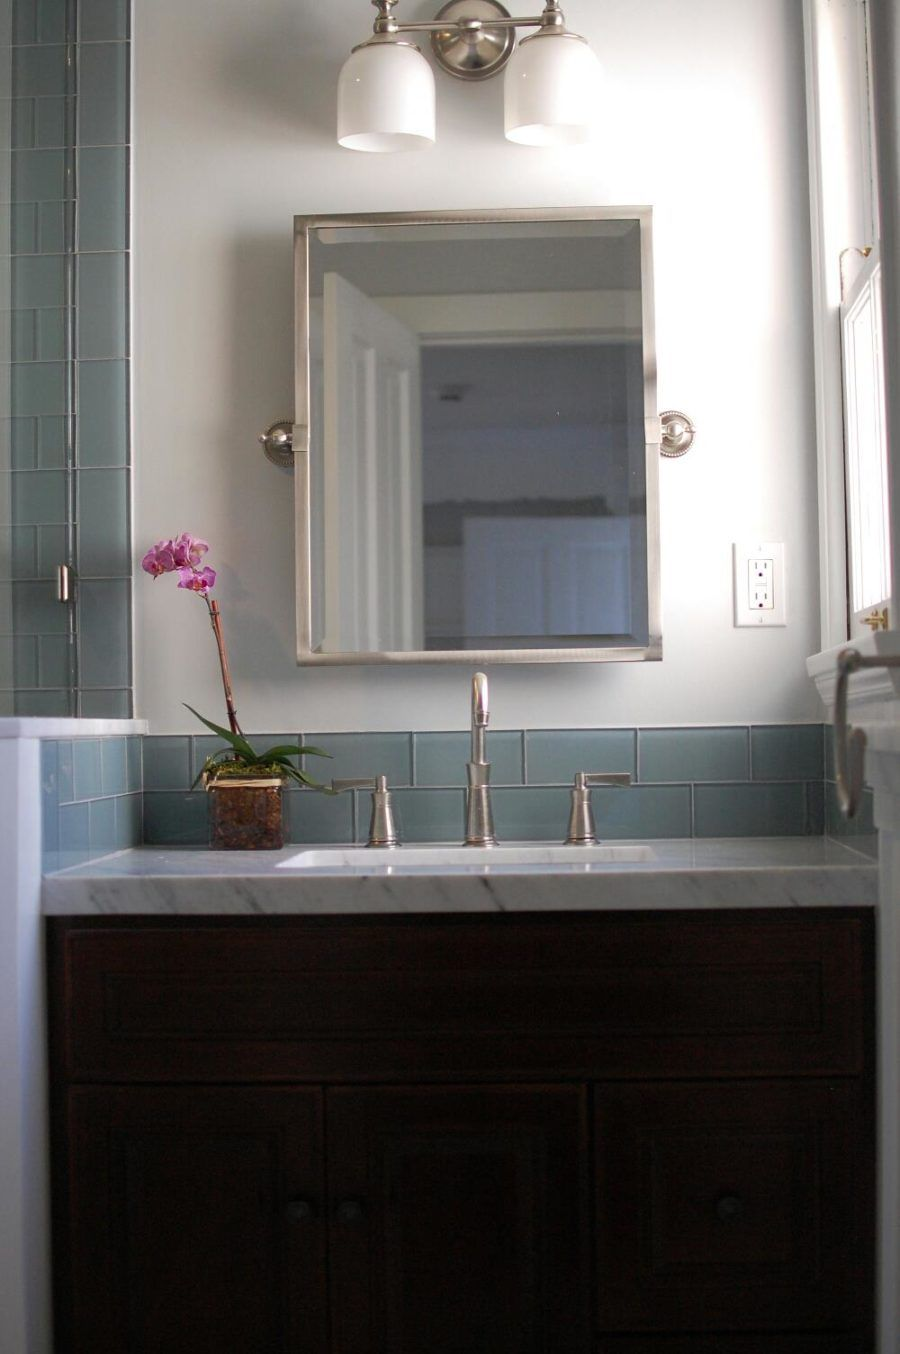 15 Glass Backsplash Ideas To Spark Your Renovation Ideas Tile Backsplash Bathroom Glass Tile Backsplash Bathroom Vanity Backsplash